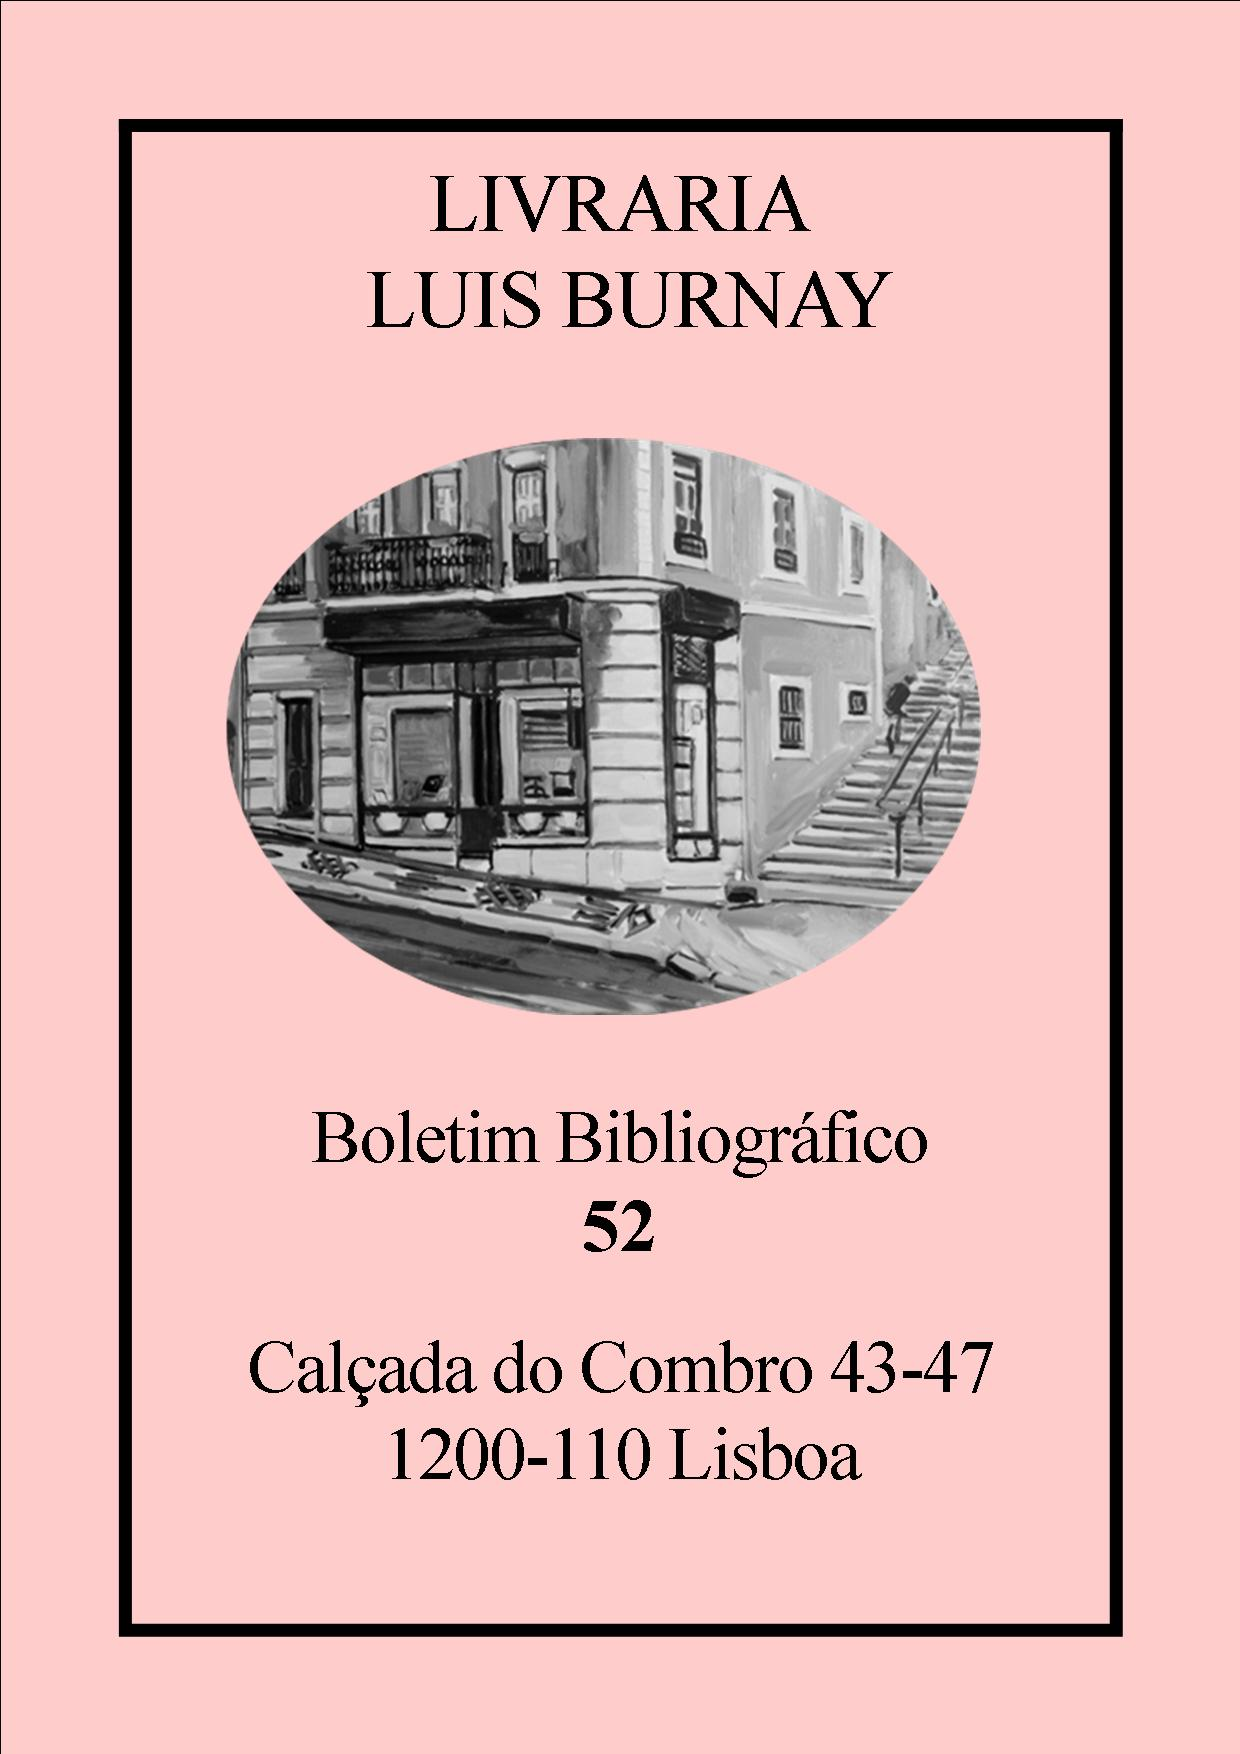 Boletim Bibliográfico nº 52